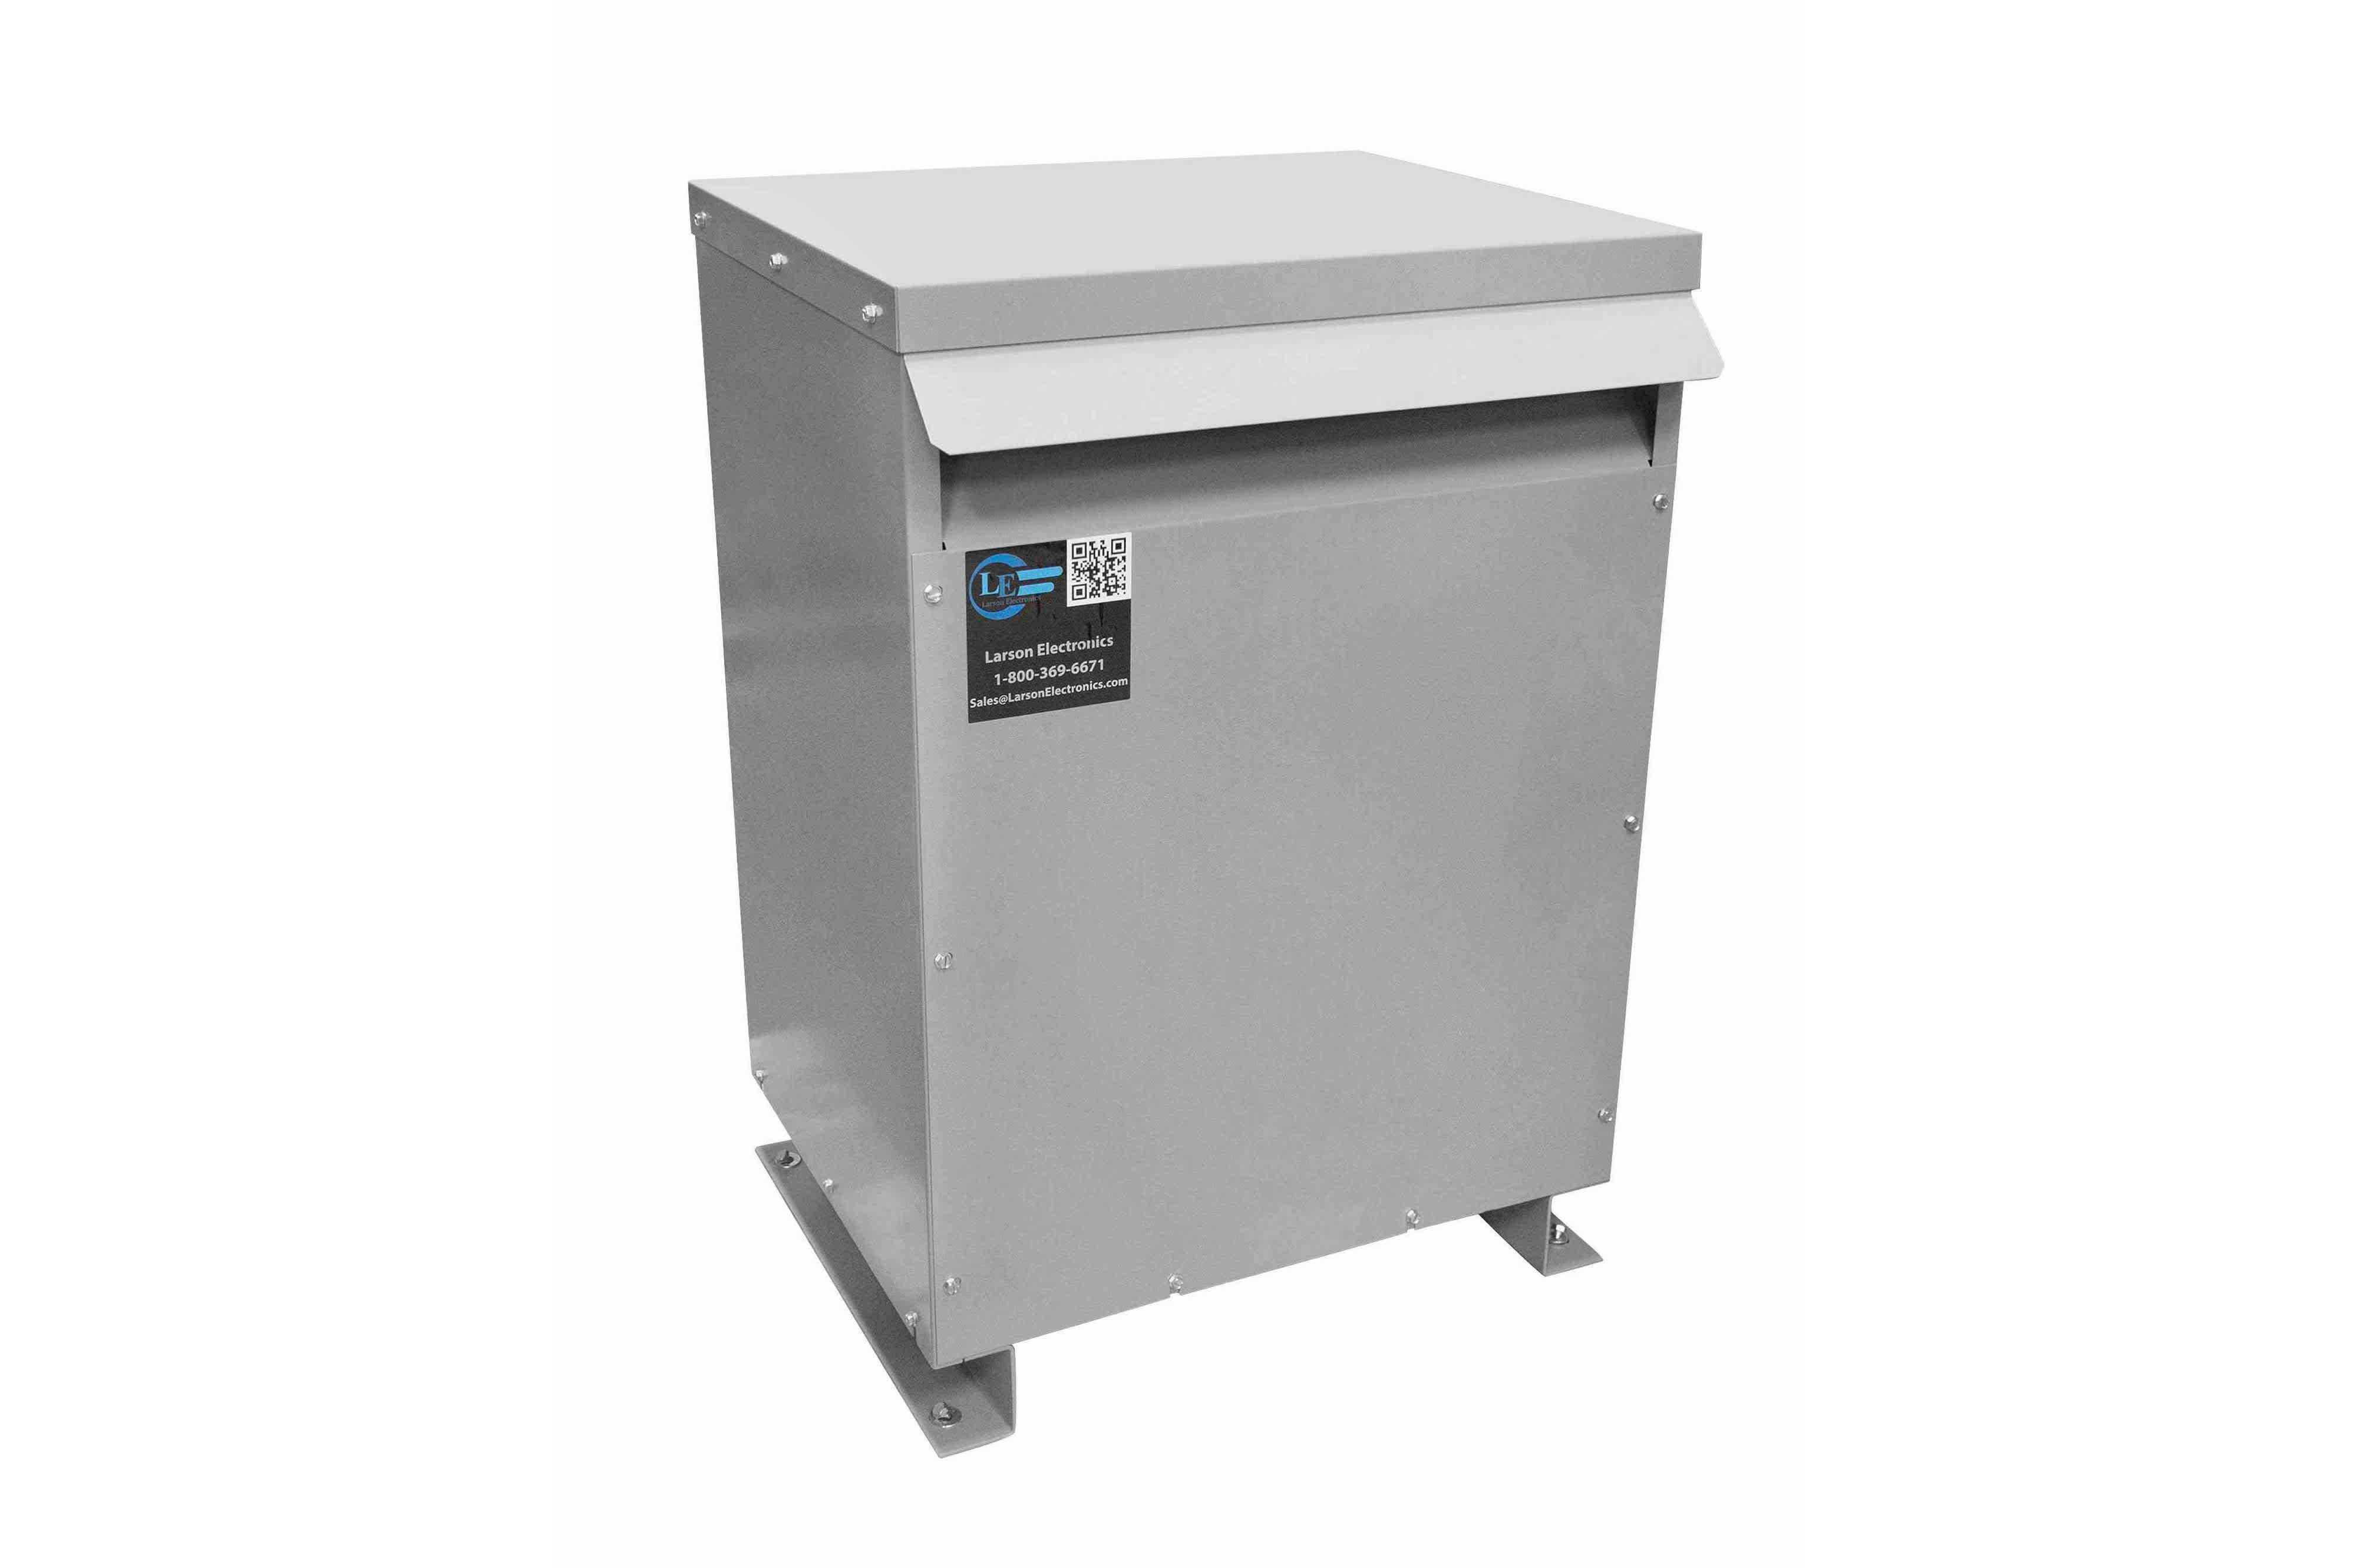 60 kVA 3PH Isolation Transformer, 480V Wye Primary, 380Y/220 Wye-N Secondary, N3R, Ventilated, 60 Hz